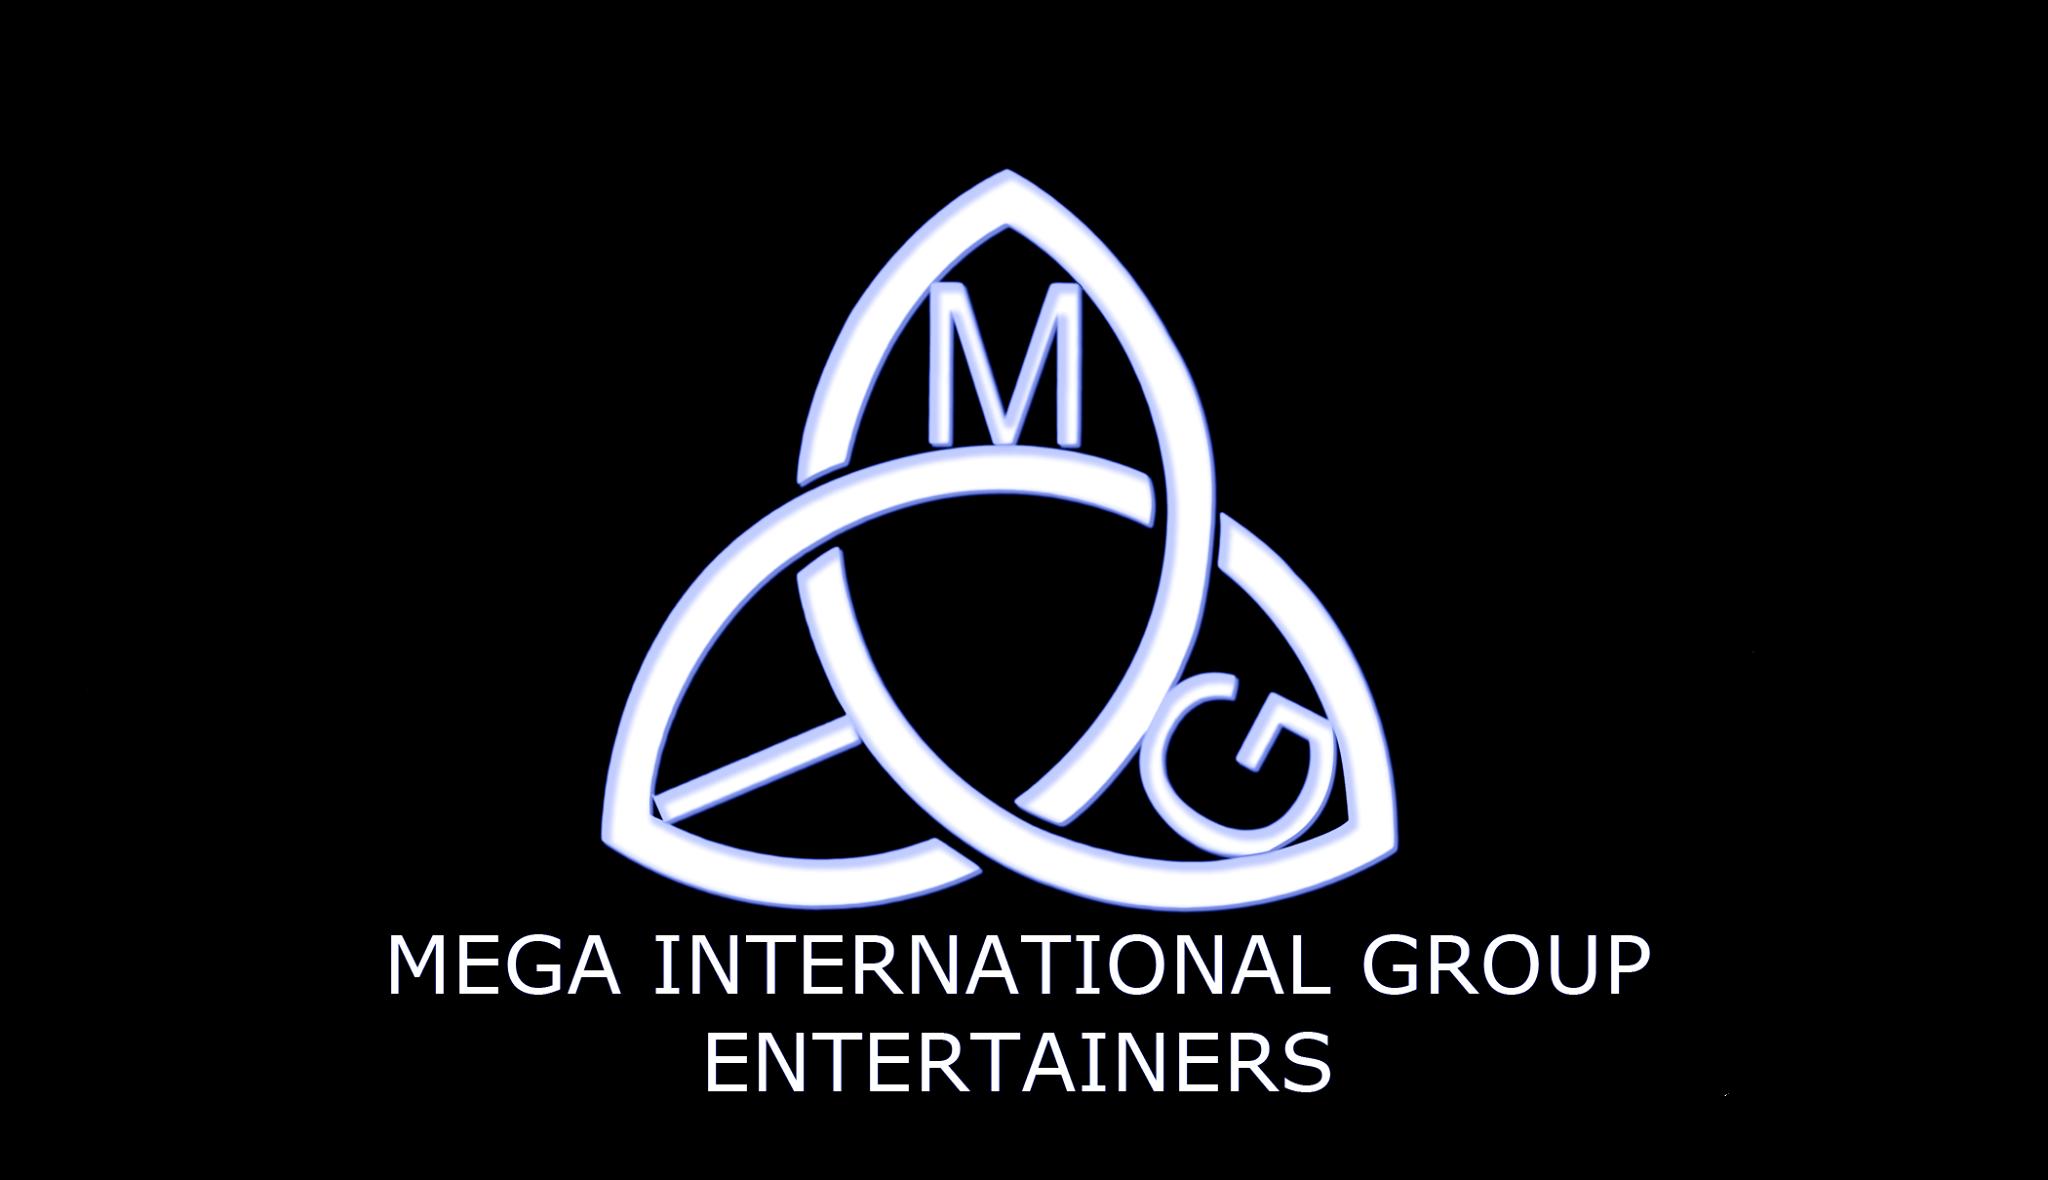 Mega International Group Entertainers